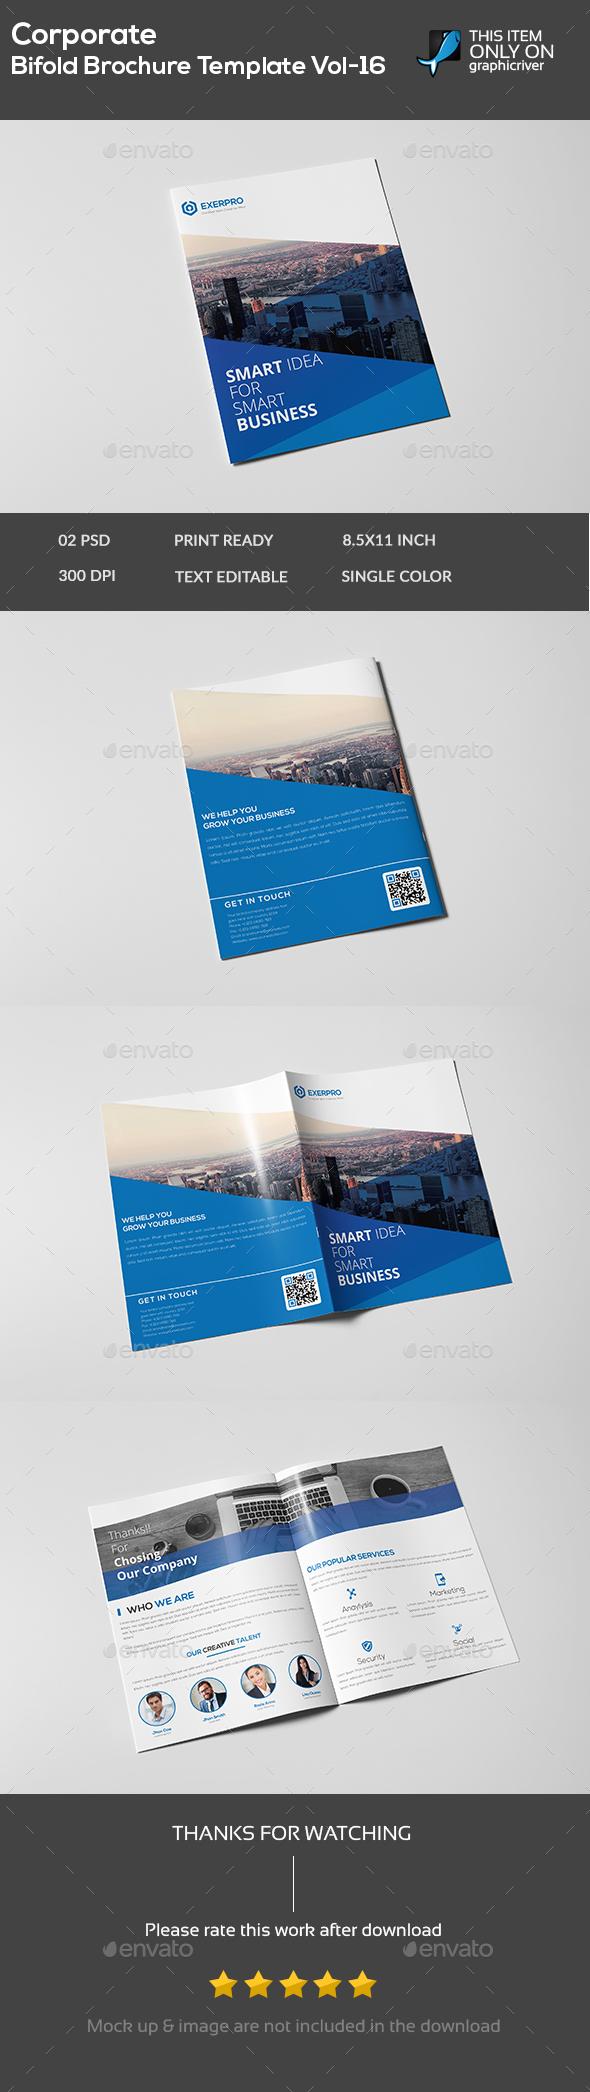 Corporate Bifold Brochure template vol-16 - Brochures Print Templates